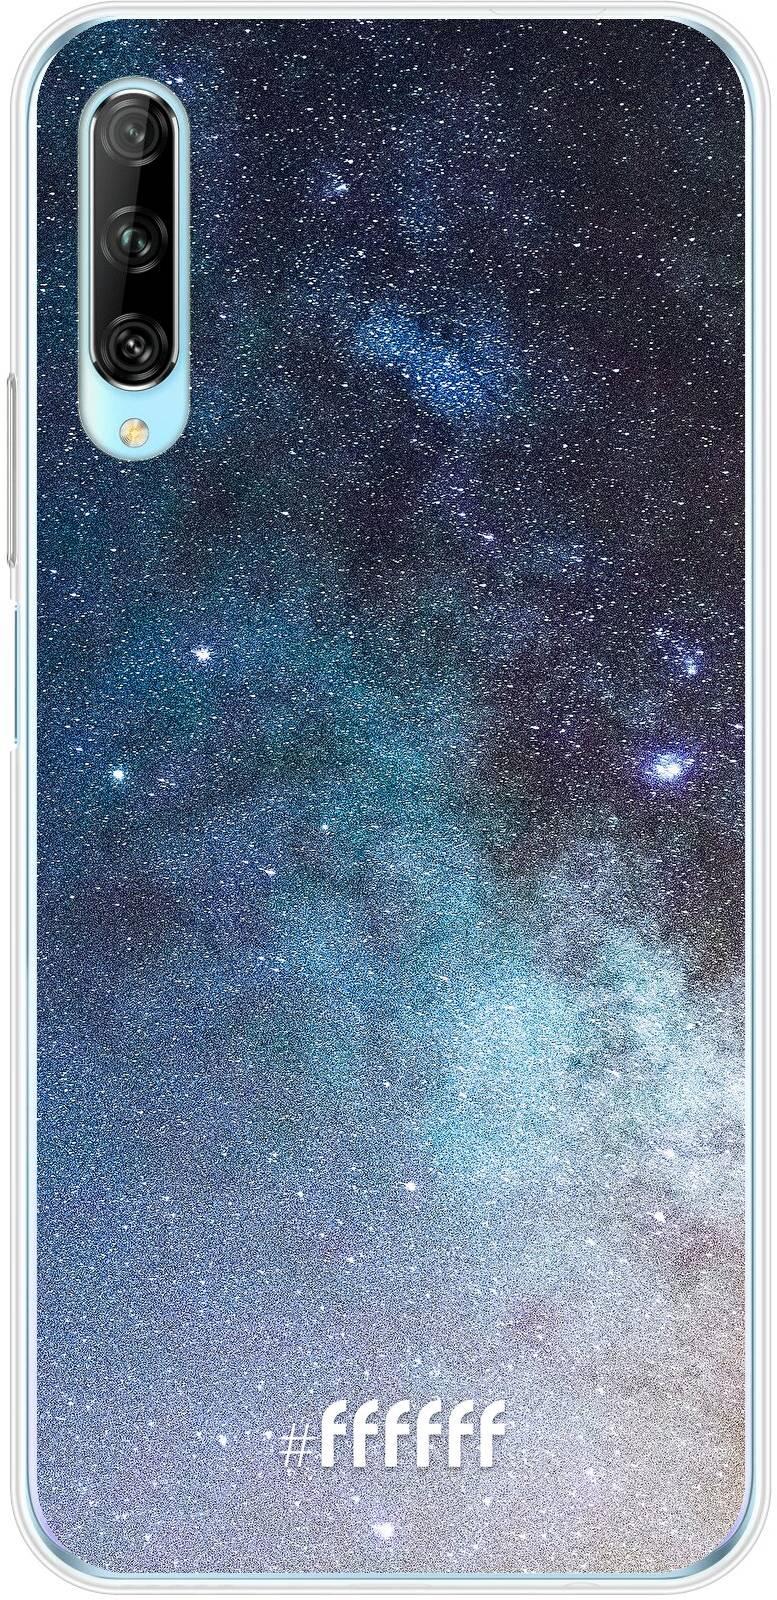 Milky Way P Smart Pro